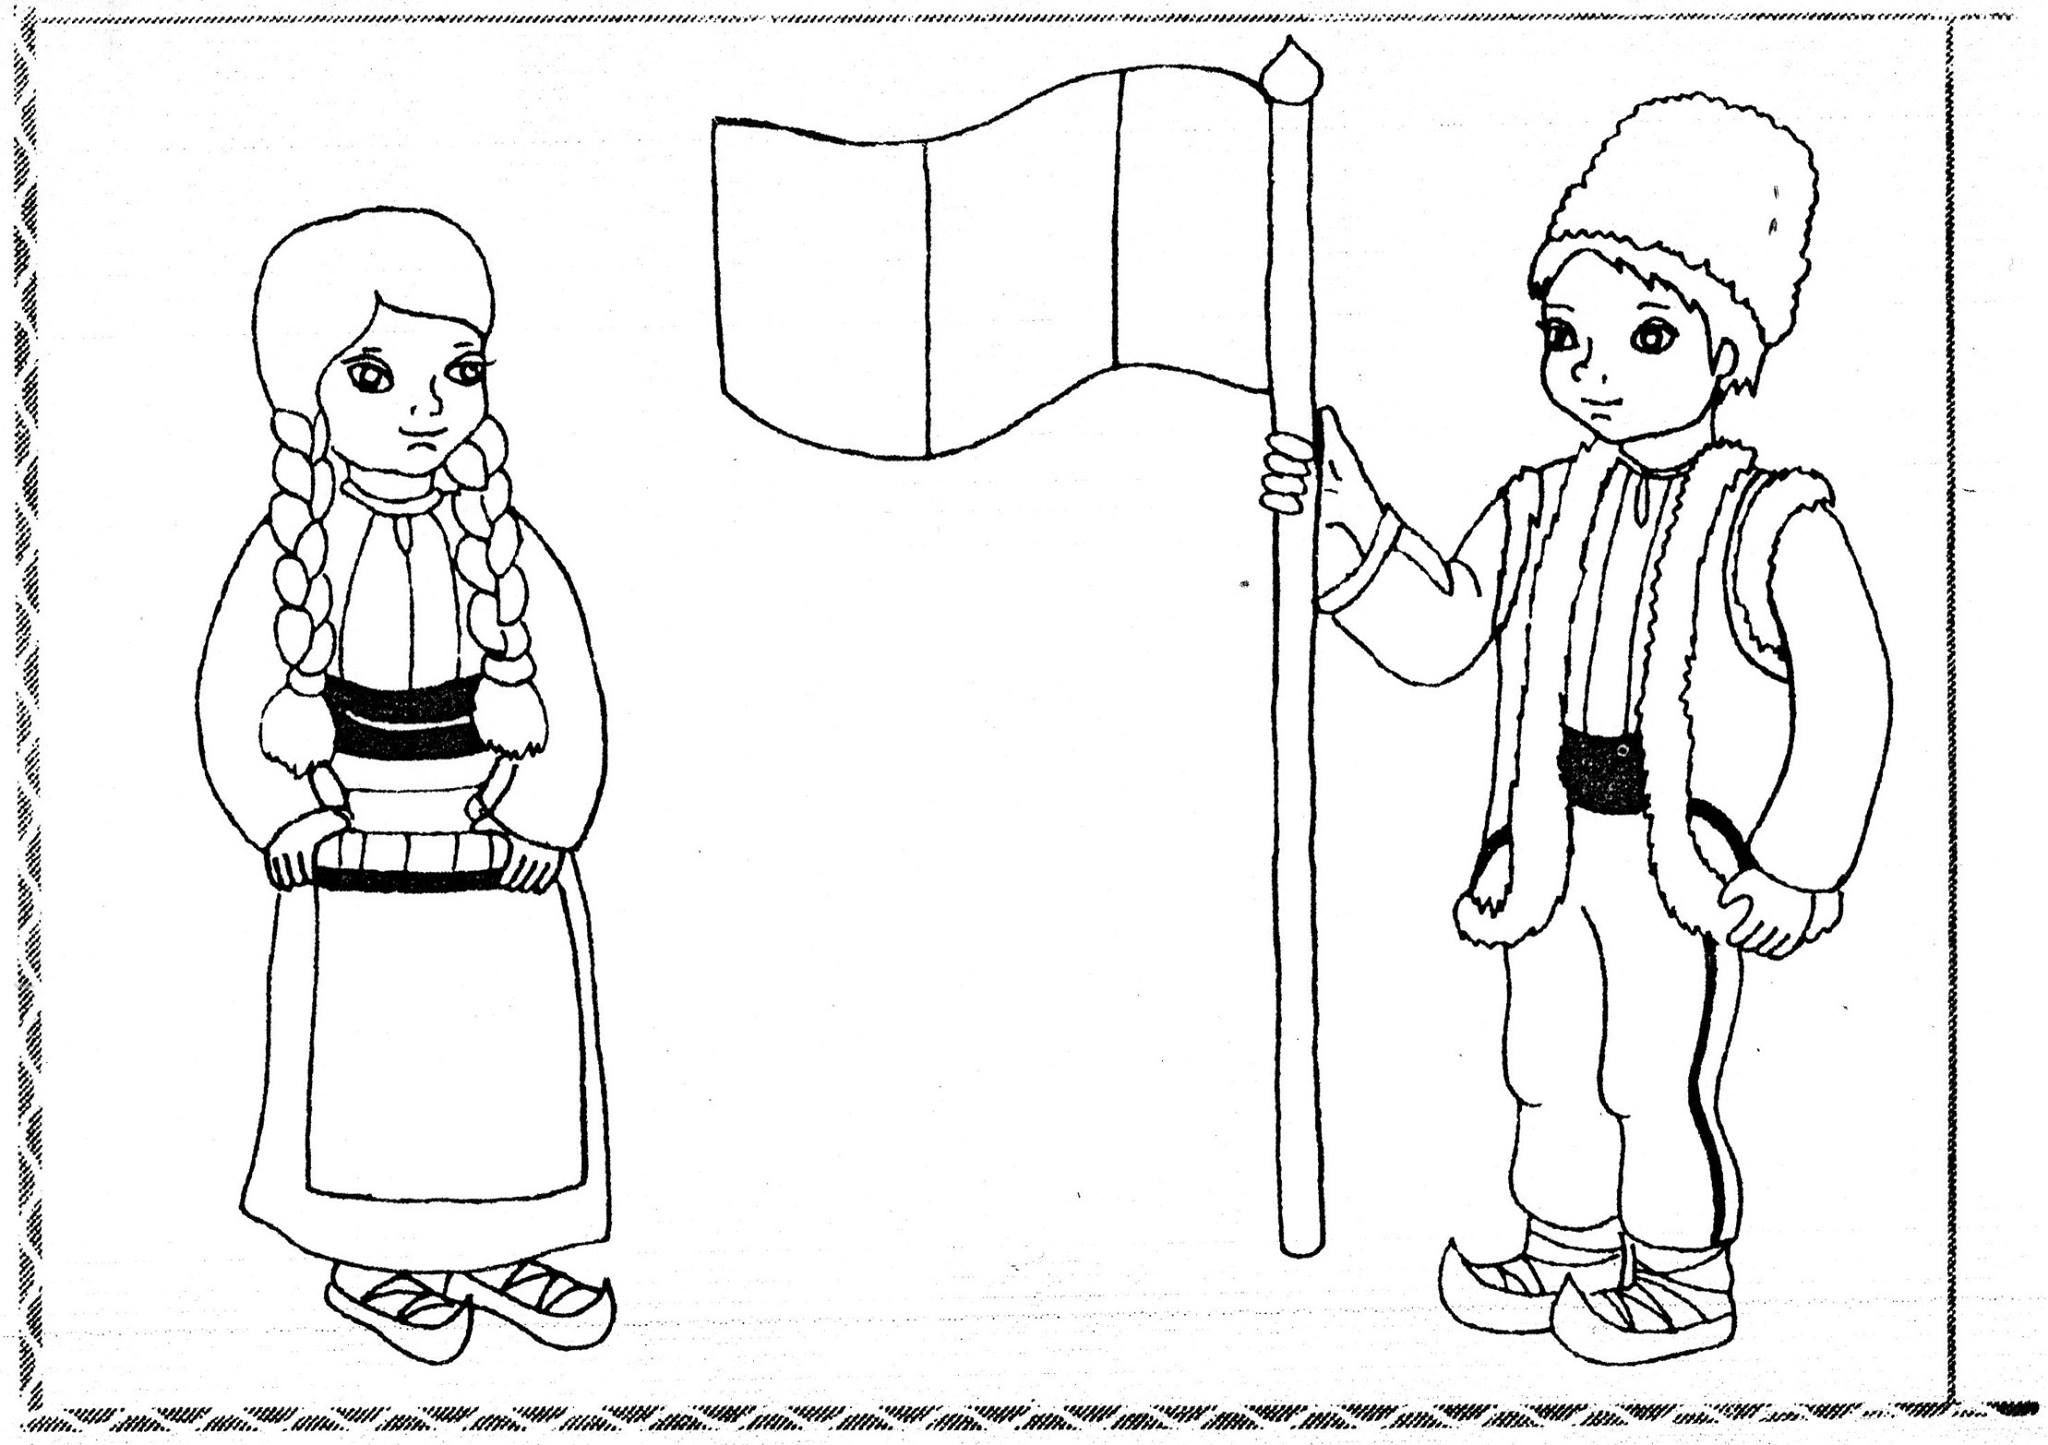 De Colorat Copii Romania Decolorat Coloringpages Drawings Children Kids Kidsactivities